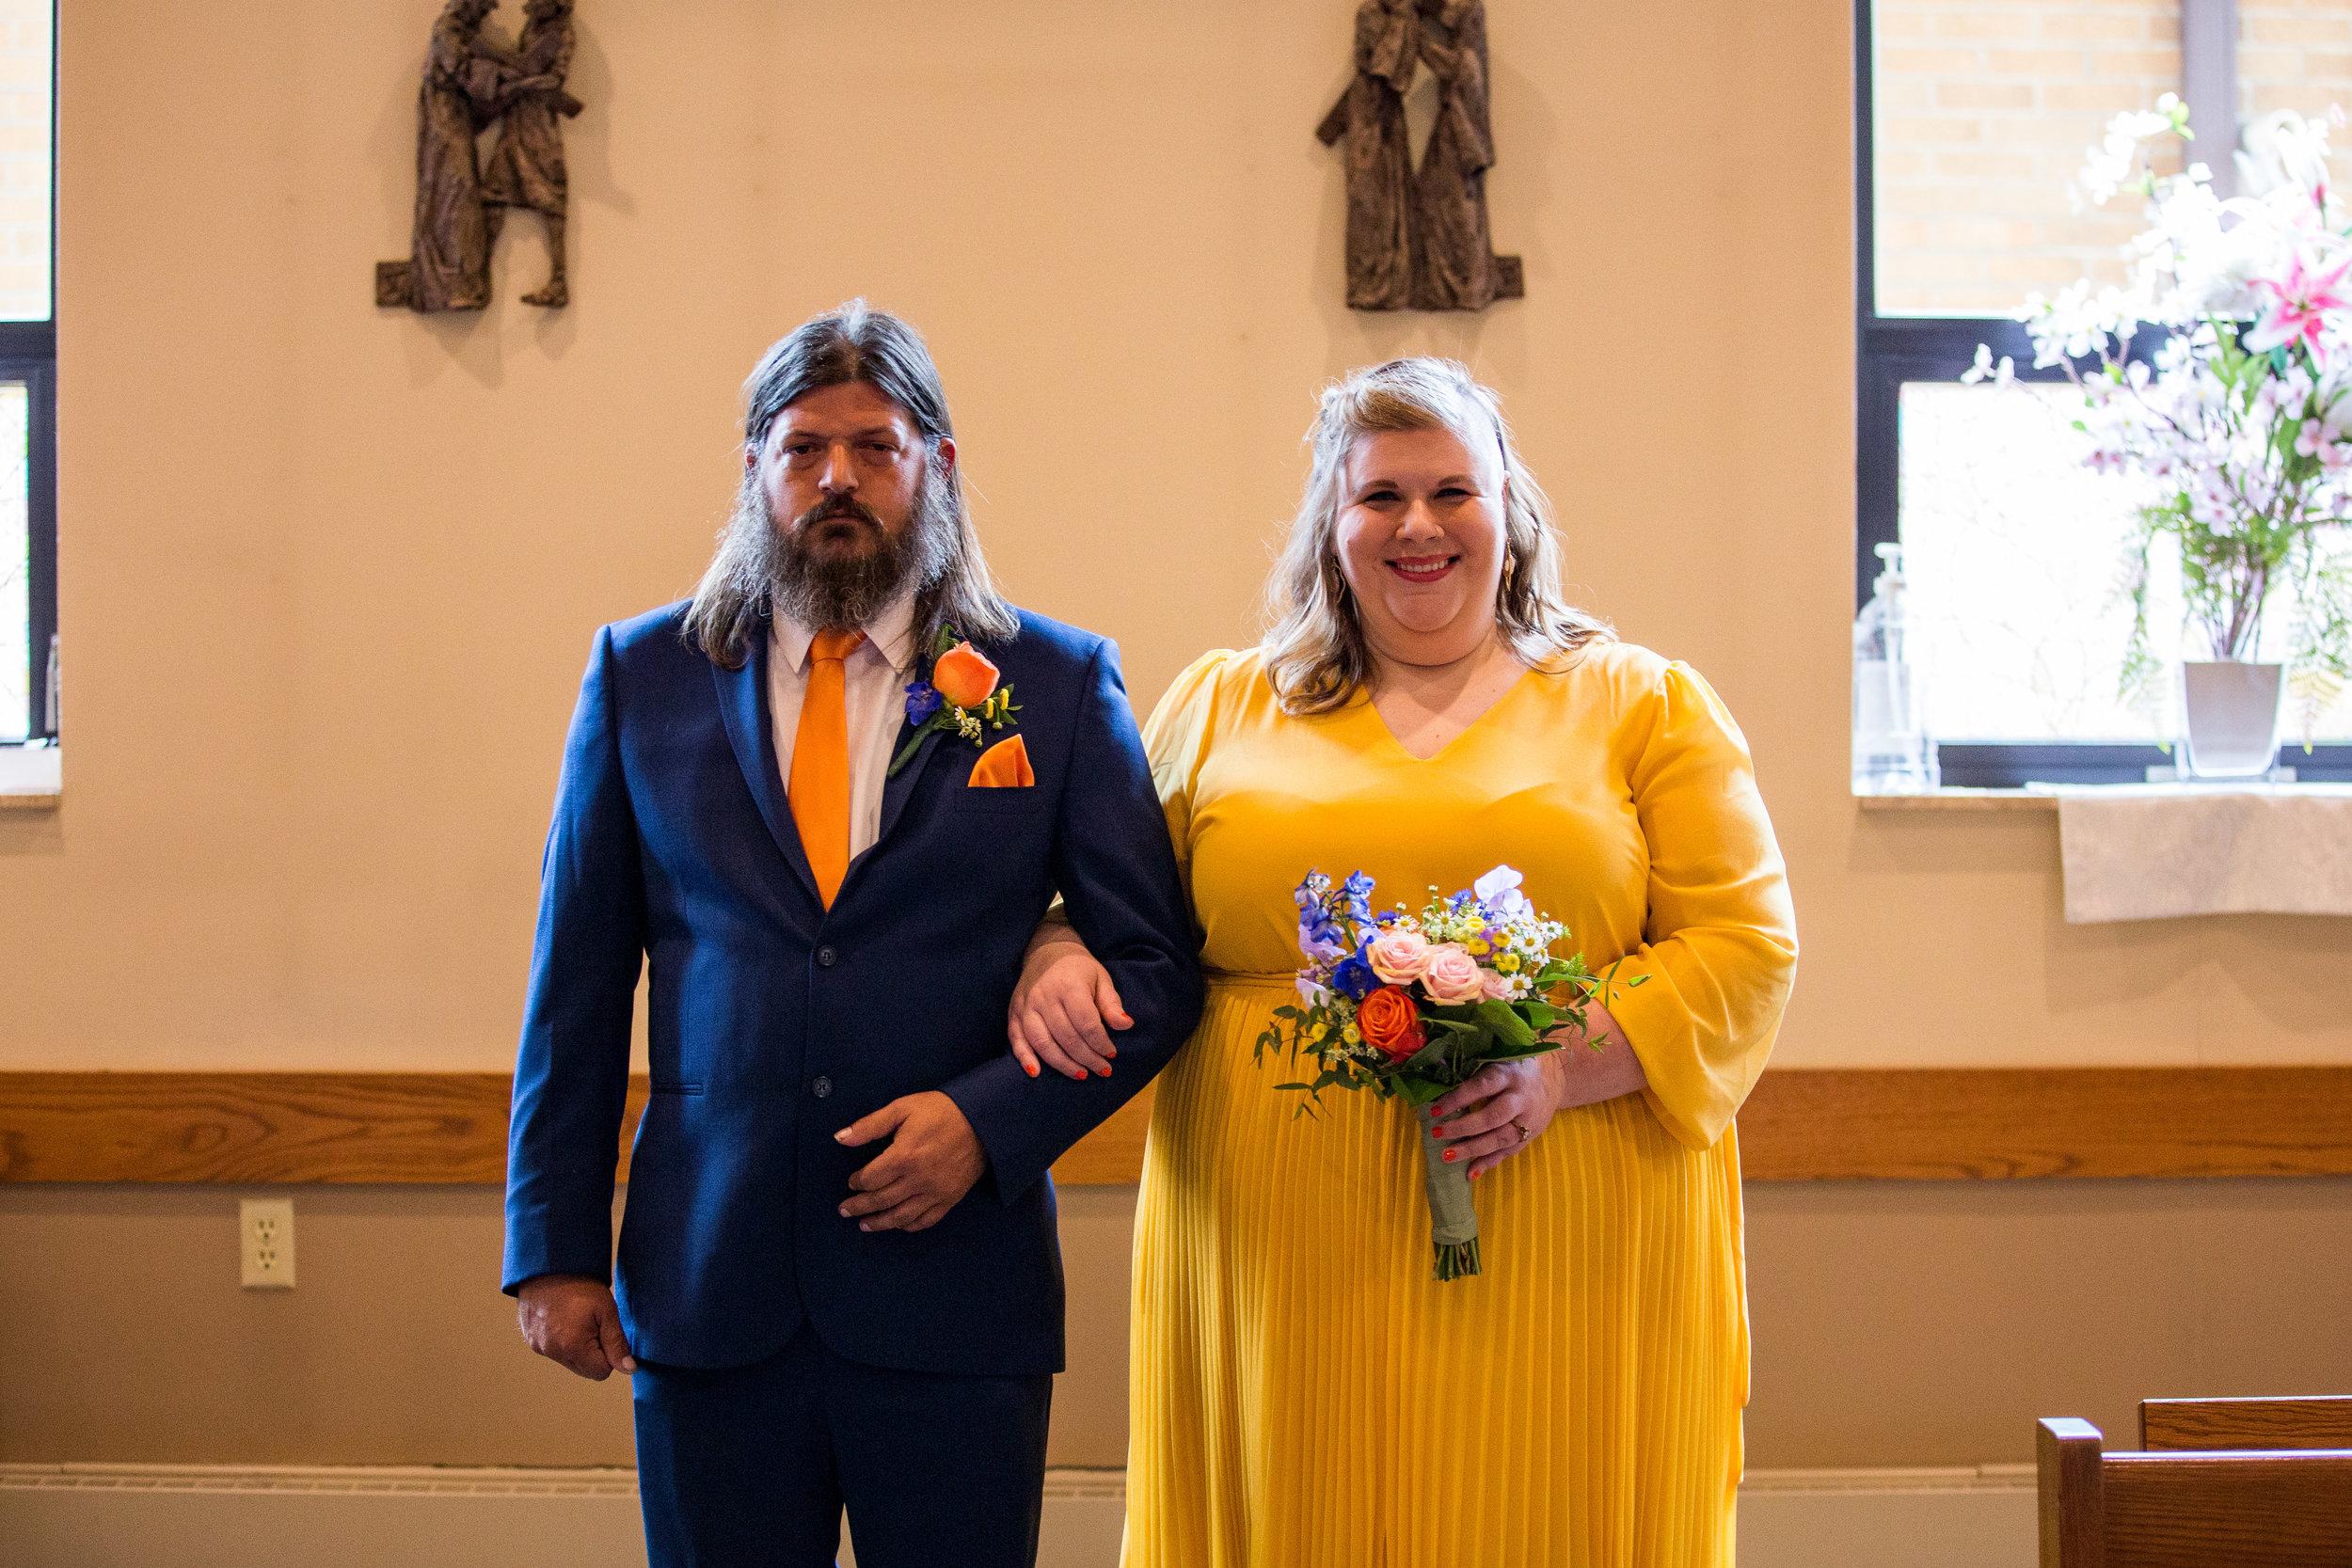 Natalie and Dallas Mooney Wedding 6-8-19_Tania Watt Photography-61.jpg